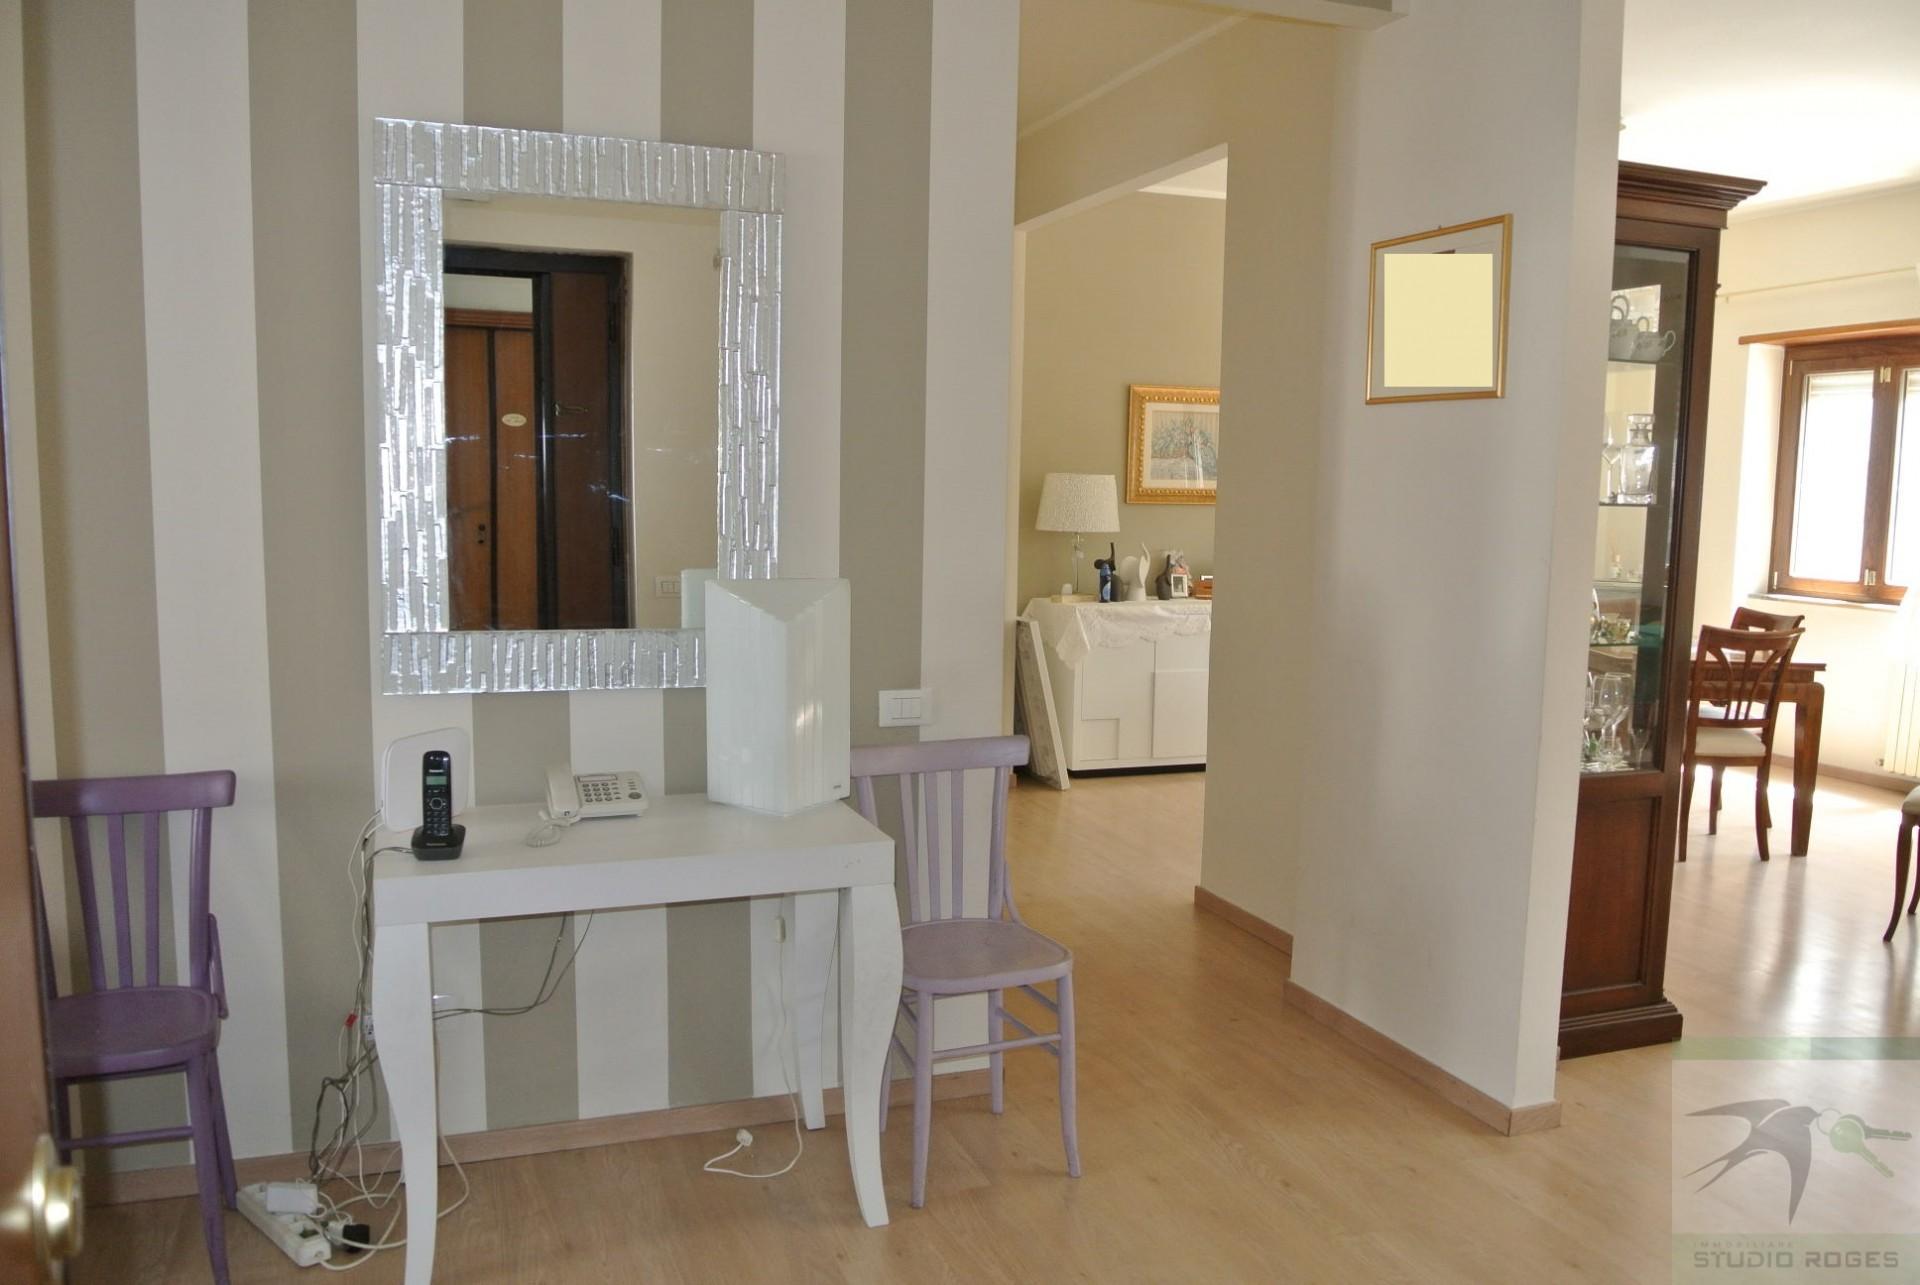 Appartamento in Vendita 139,23 mq - N. camere: 4 - - Rende - Roges-Commenda (CS)